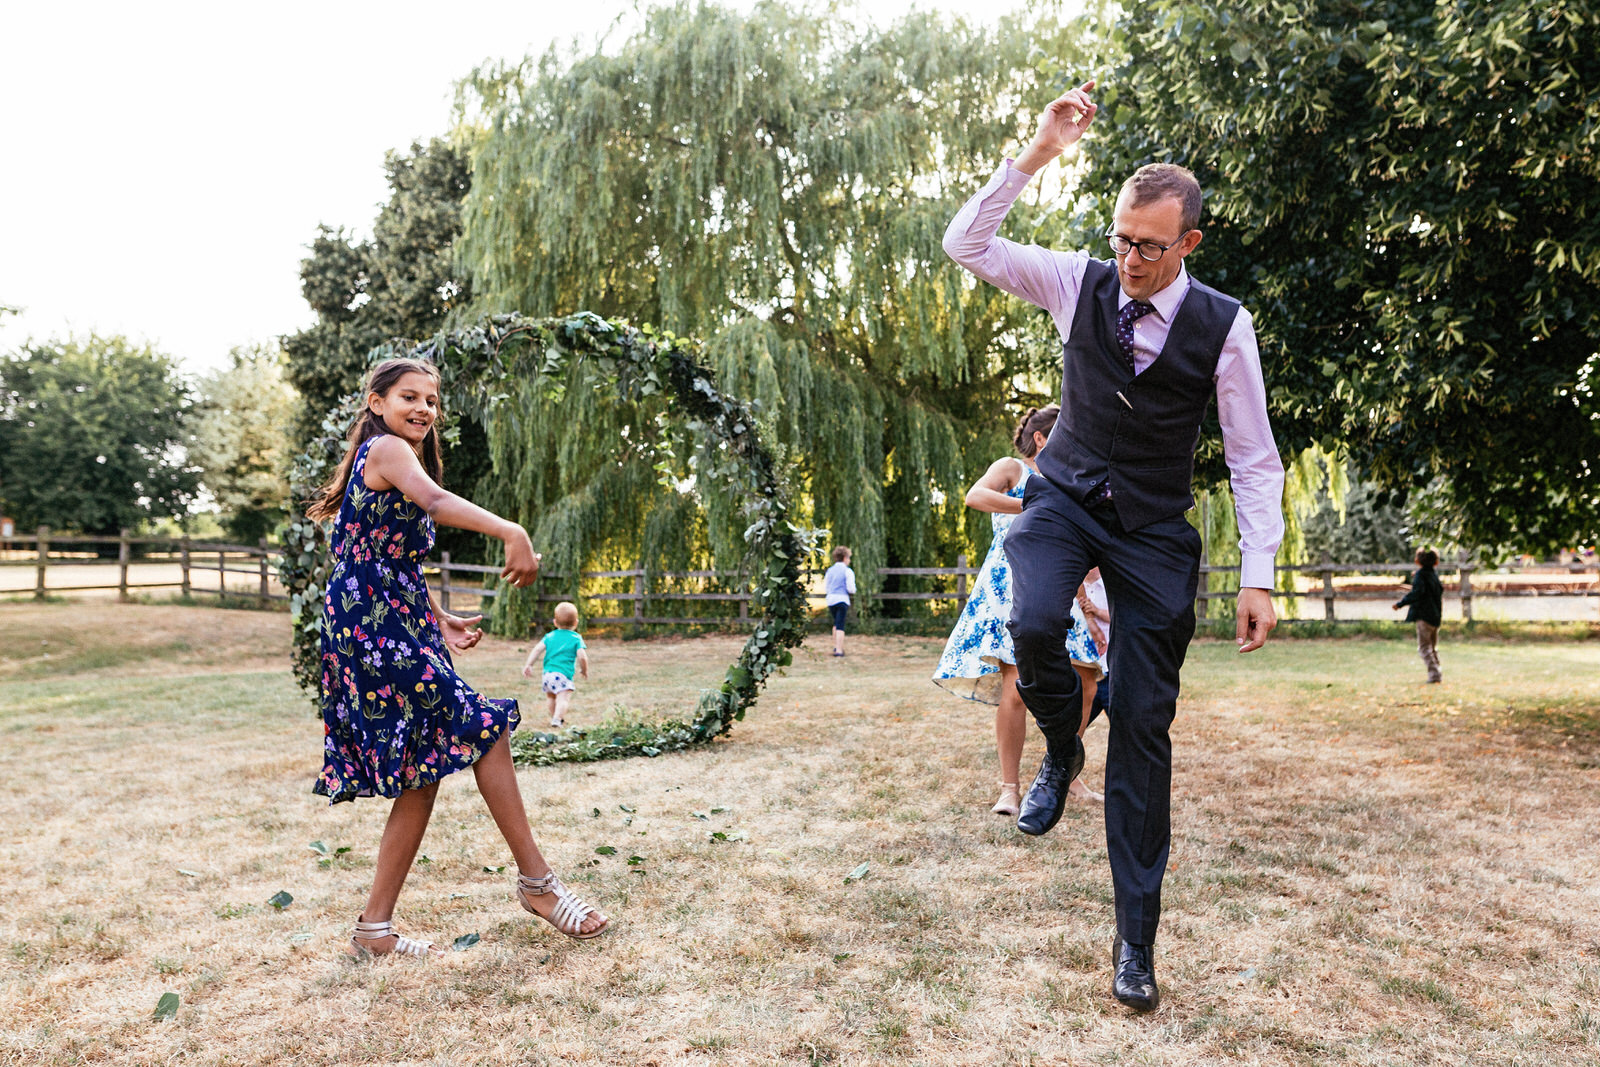 Edworth-Manor-Farm-Wedding-Photographer-054.jpg